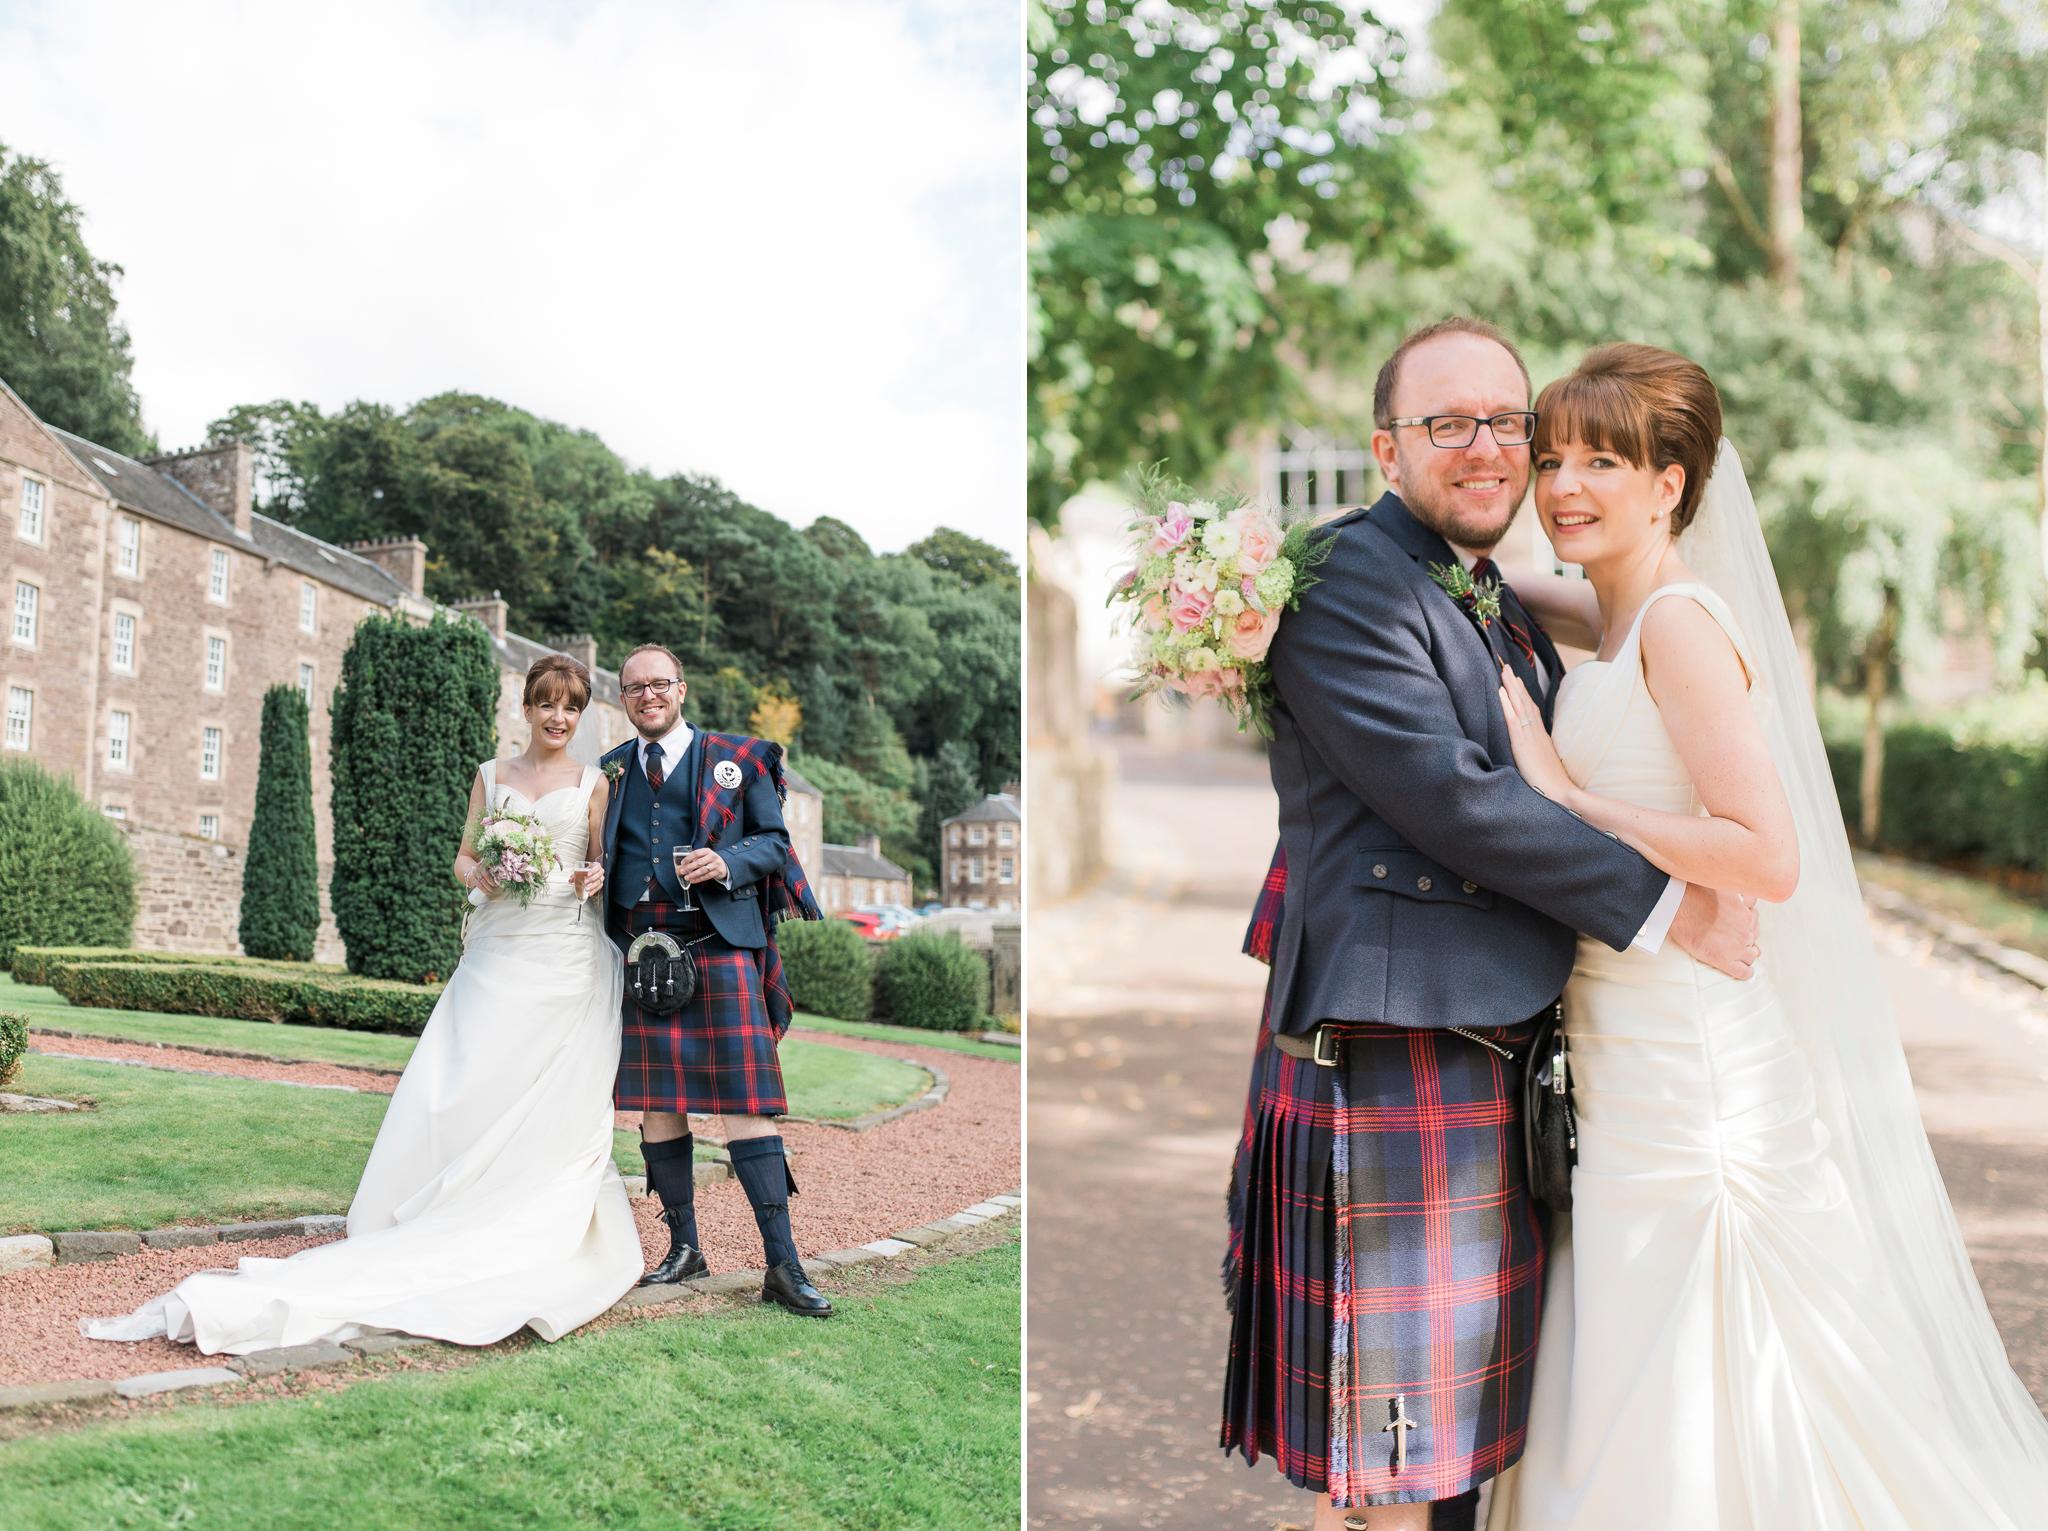 073-scotland-wedding-photographer.jpg